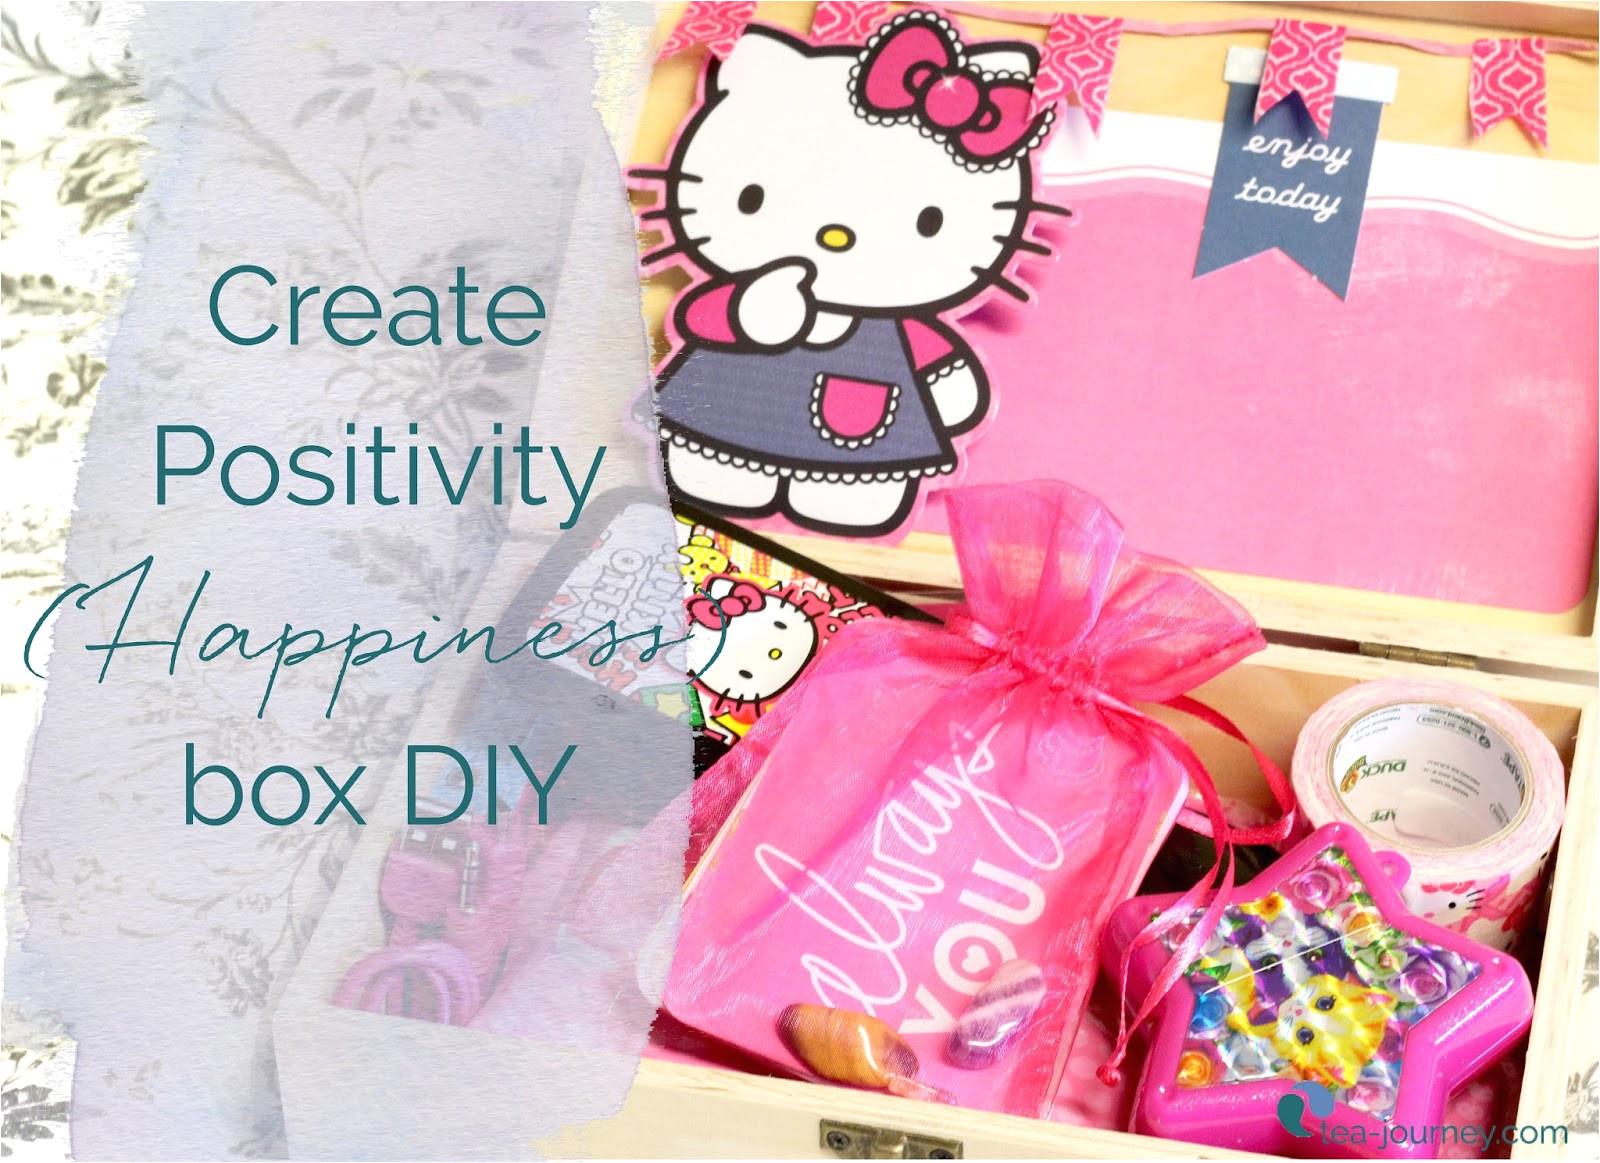 positivity box cheer up gift diy comfort box happiness jpg